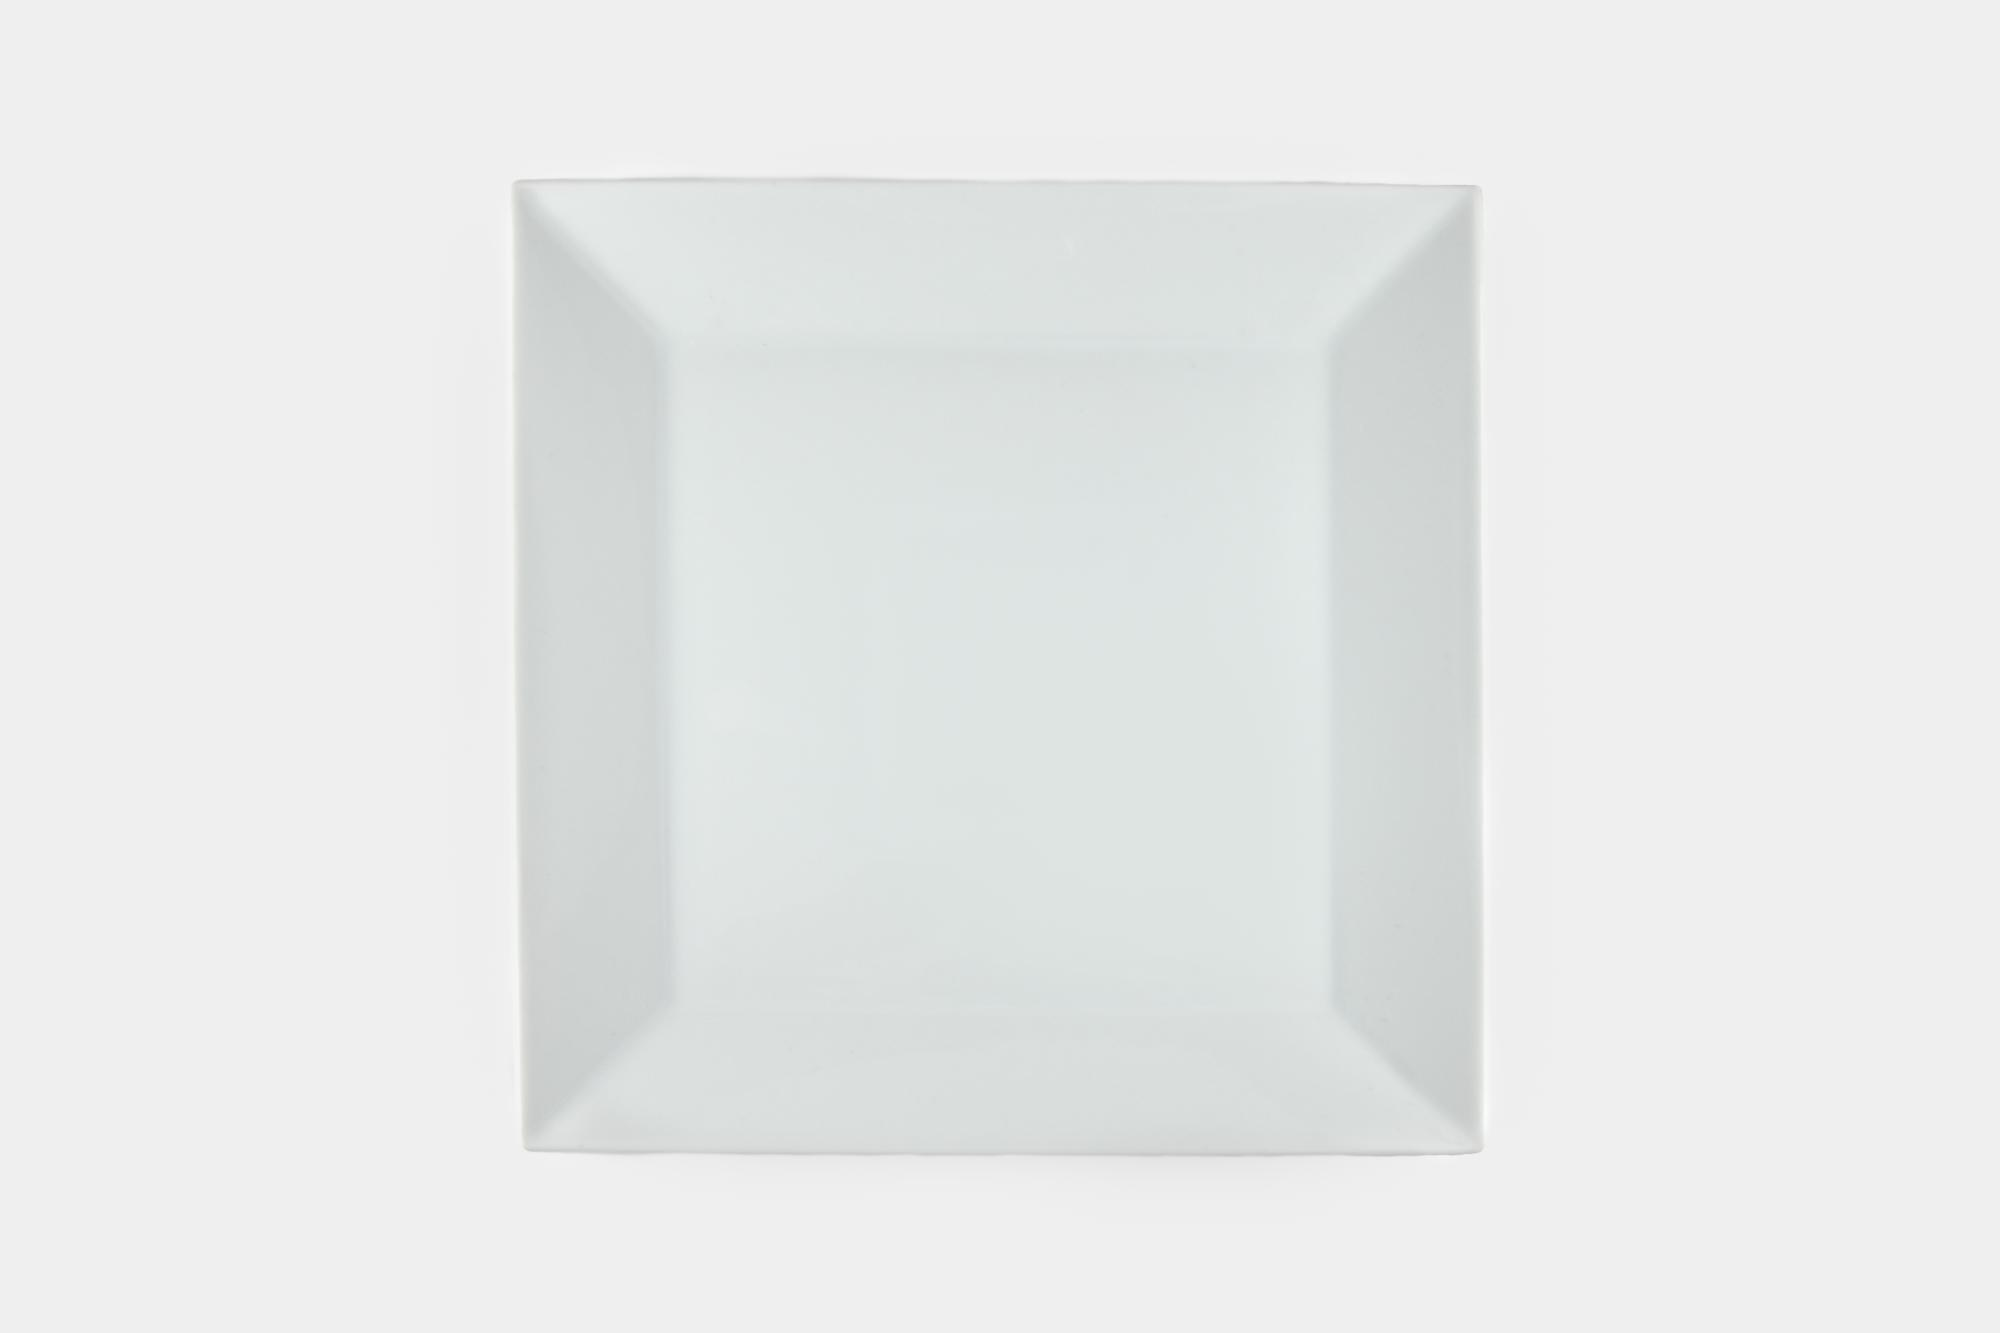 Square plate set - Image 0